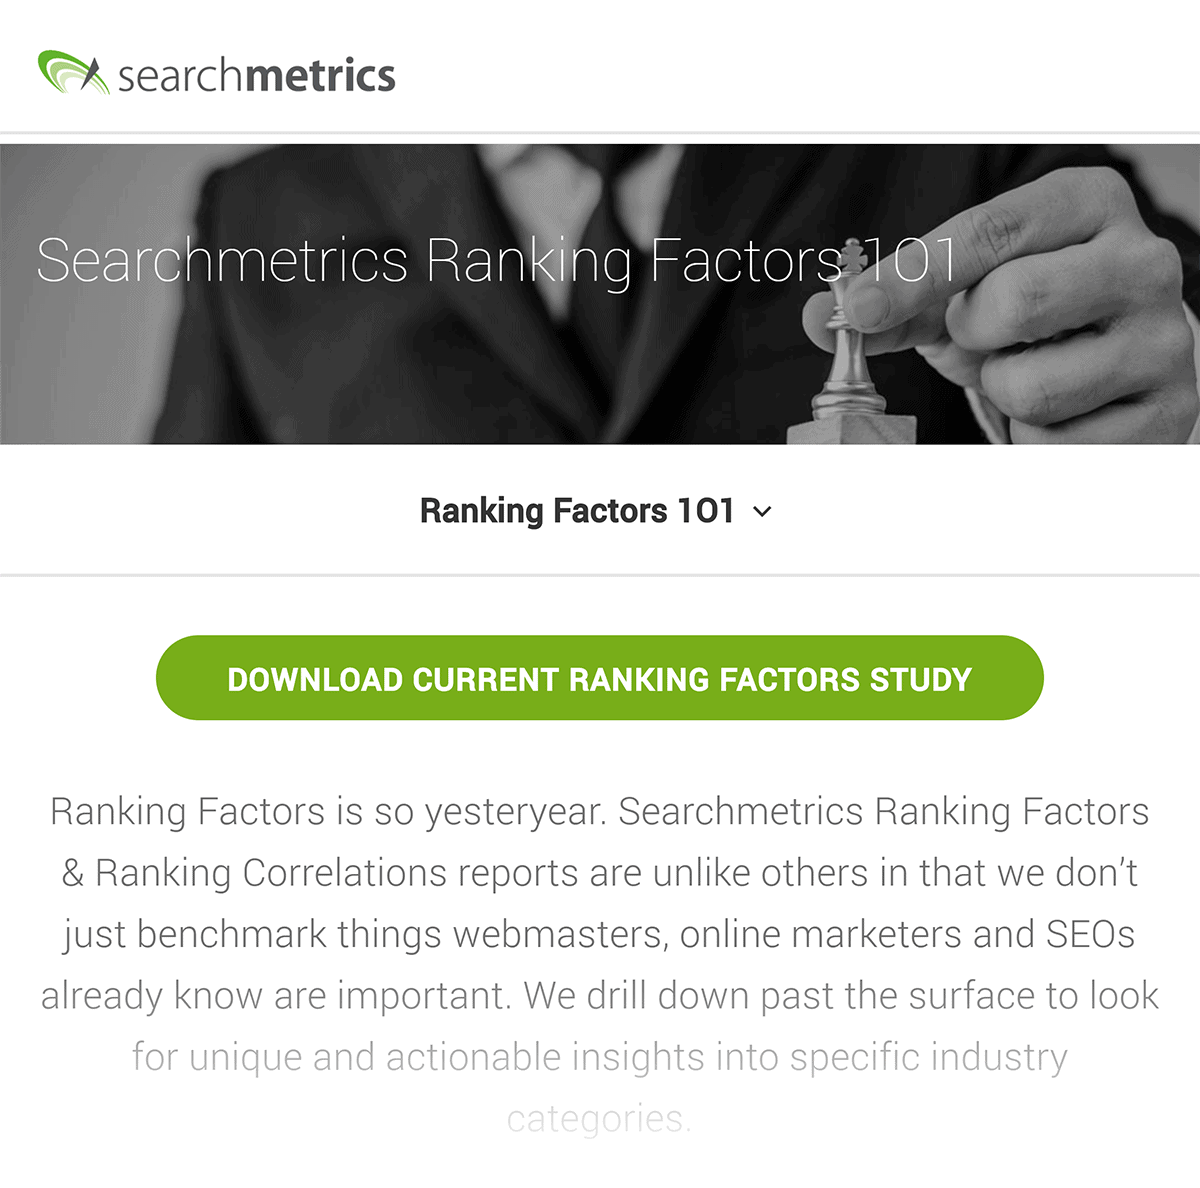 SearchMetrics – Ranking factors content